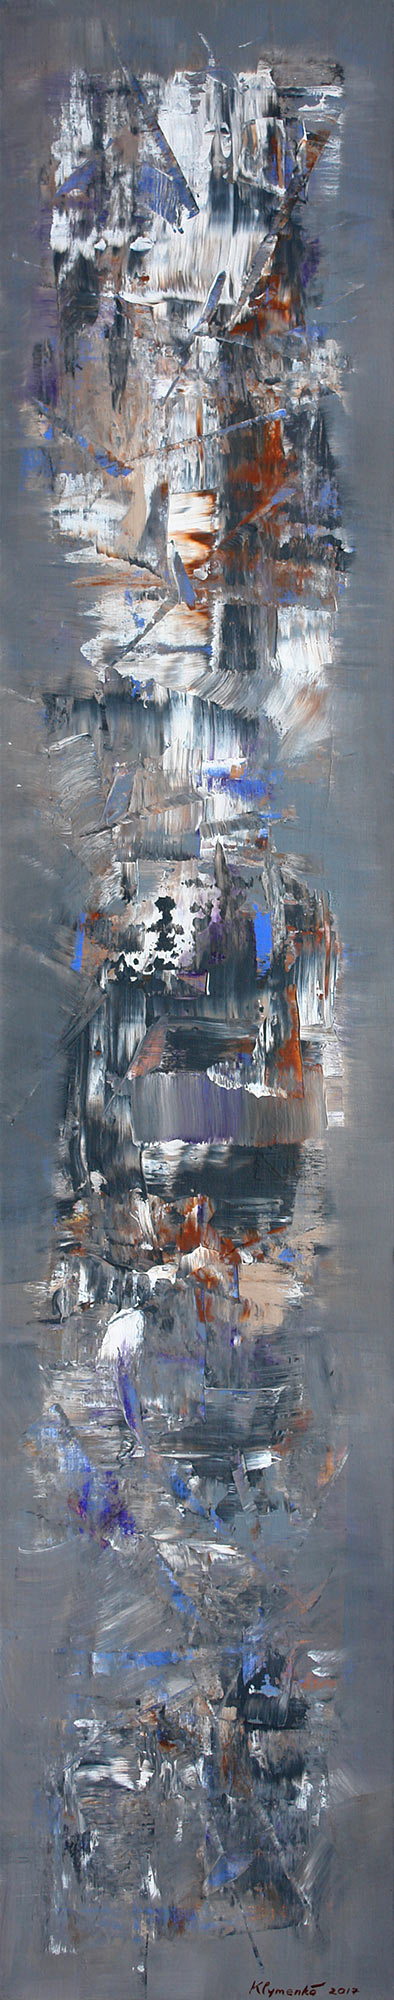 WAY OF SAMURAI, 2017 acrylic on canvas, original media; 190 х 40 cm